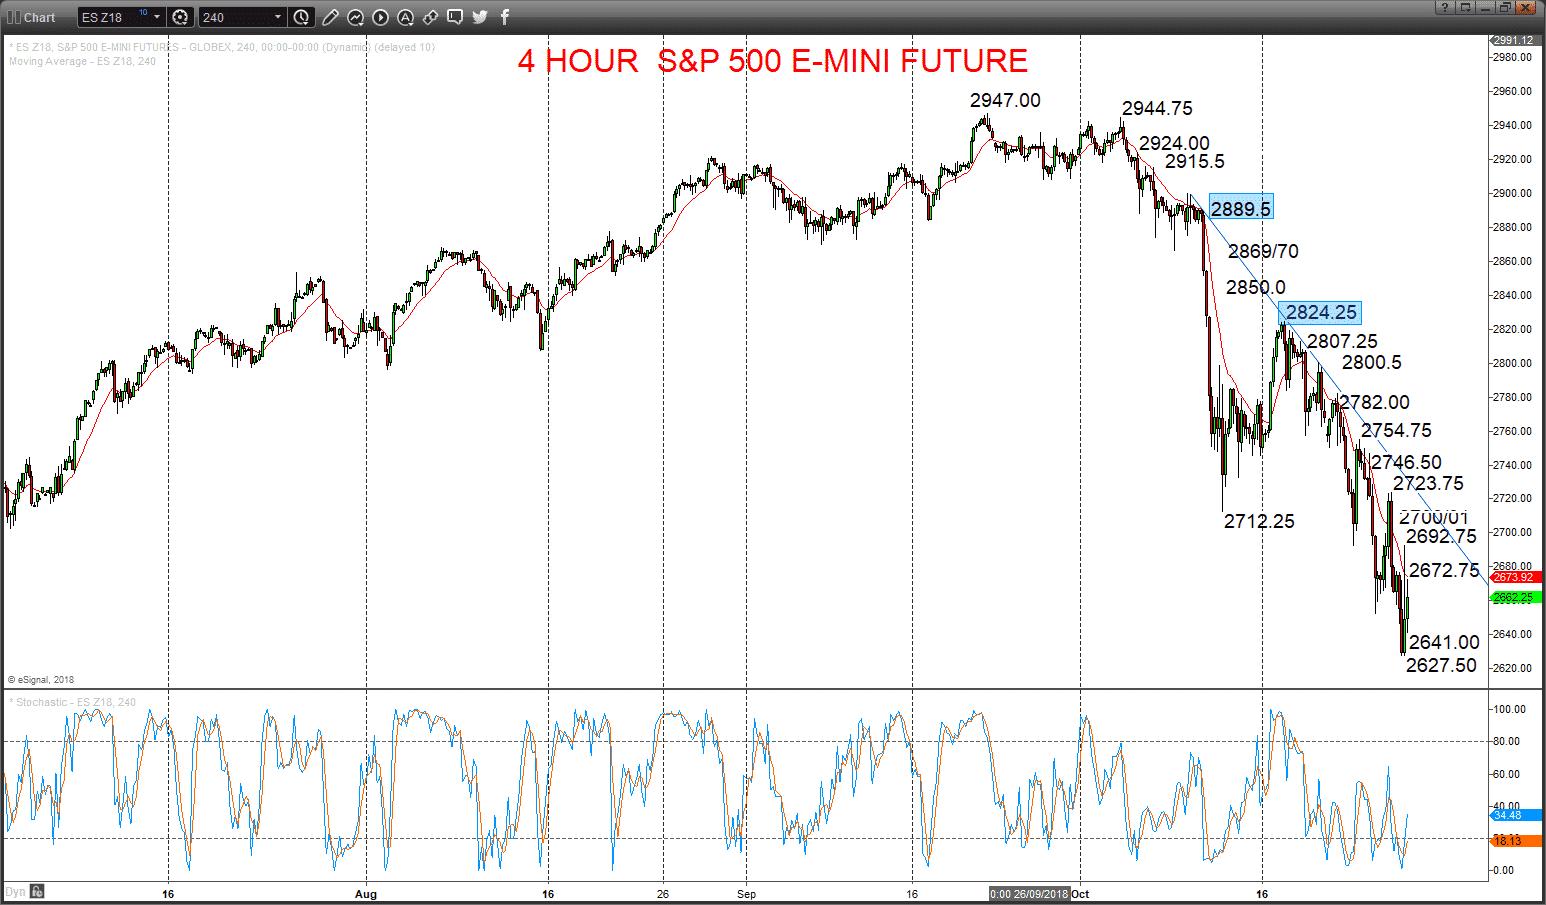 S&P Screenshots 2018-10-28